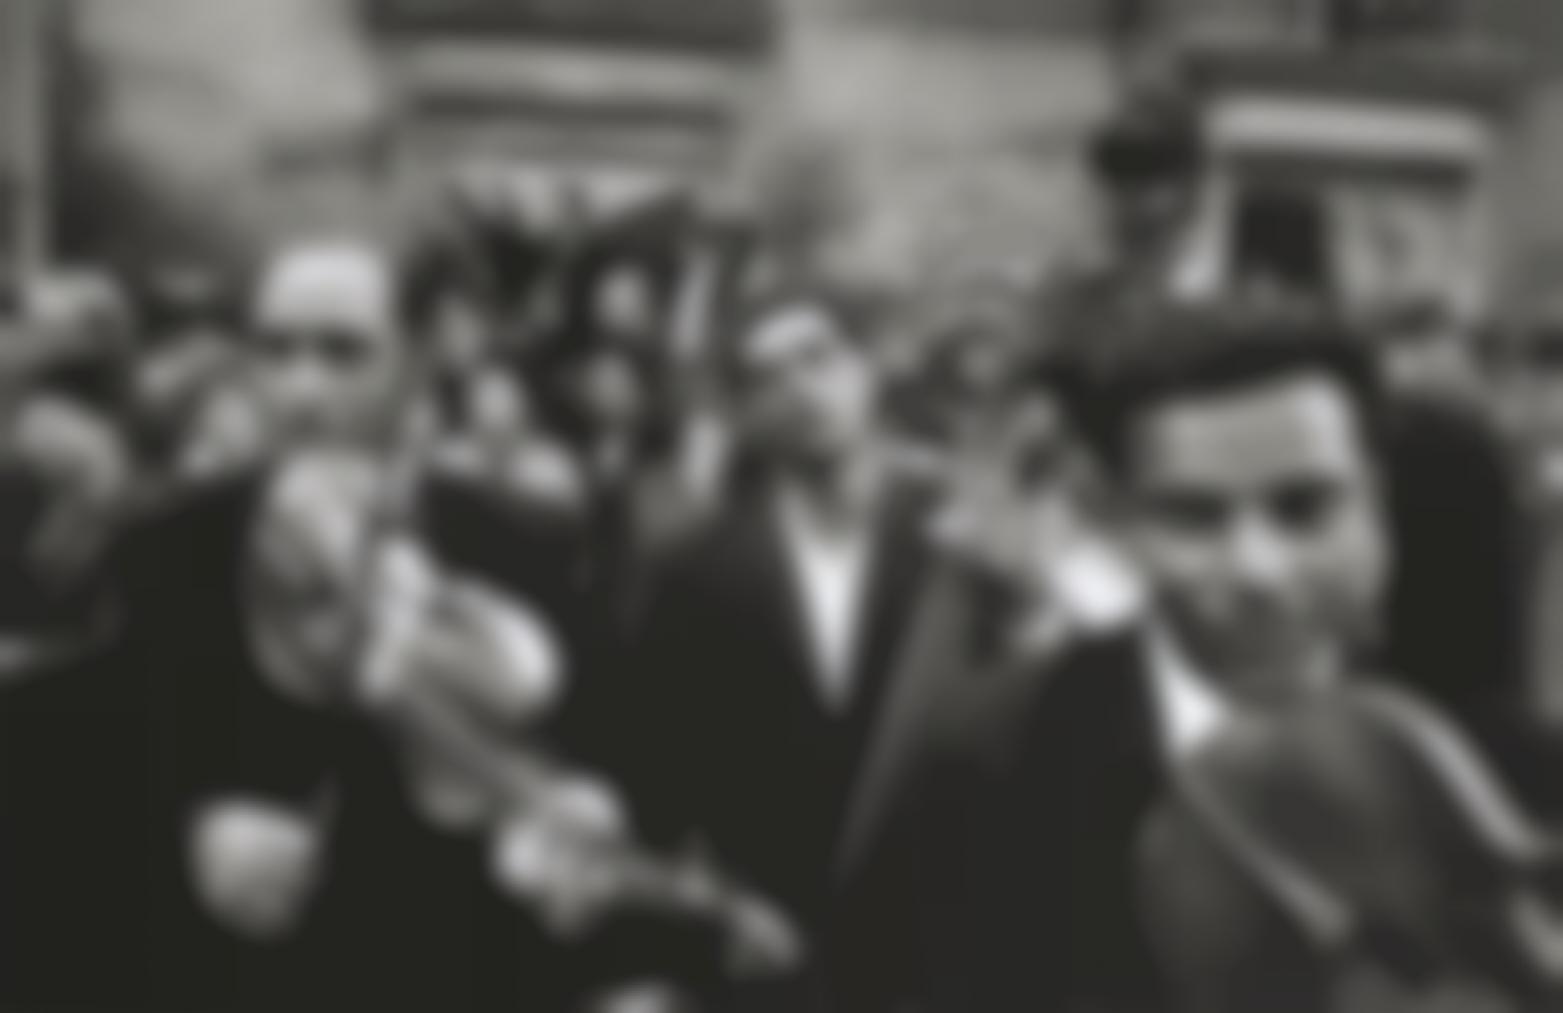 Josef Koudelka-Stra?Nice, Moravia, Czechoslovakia-1966